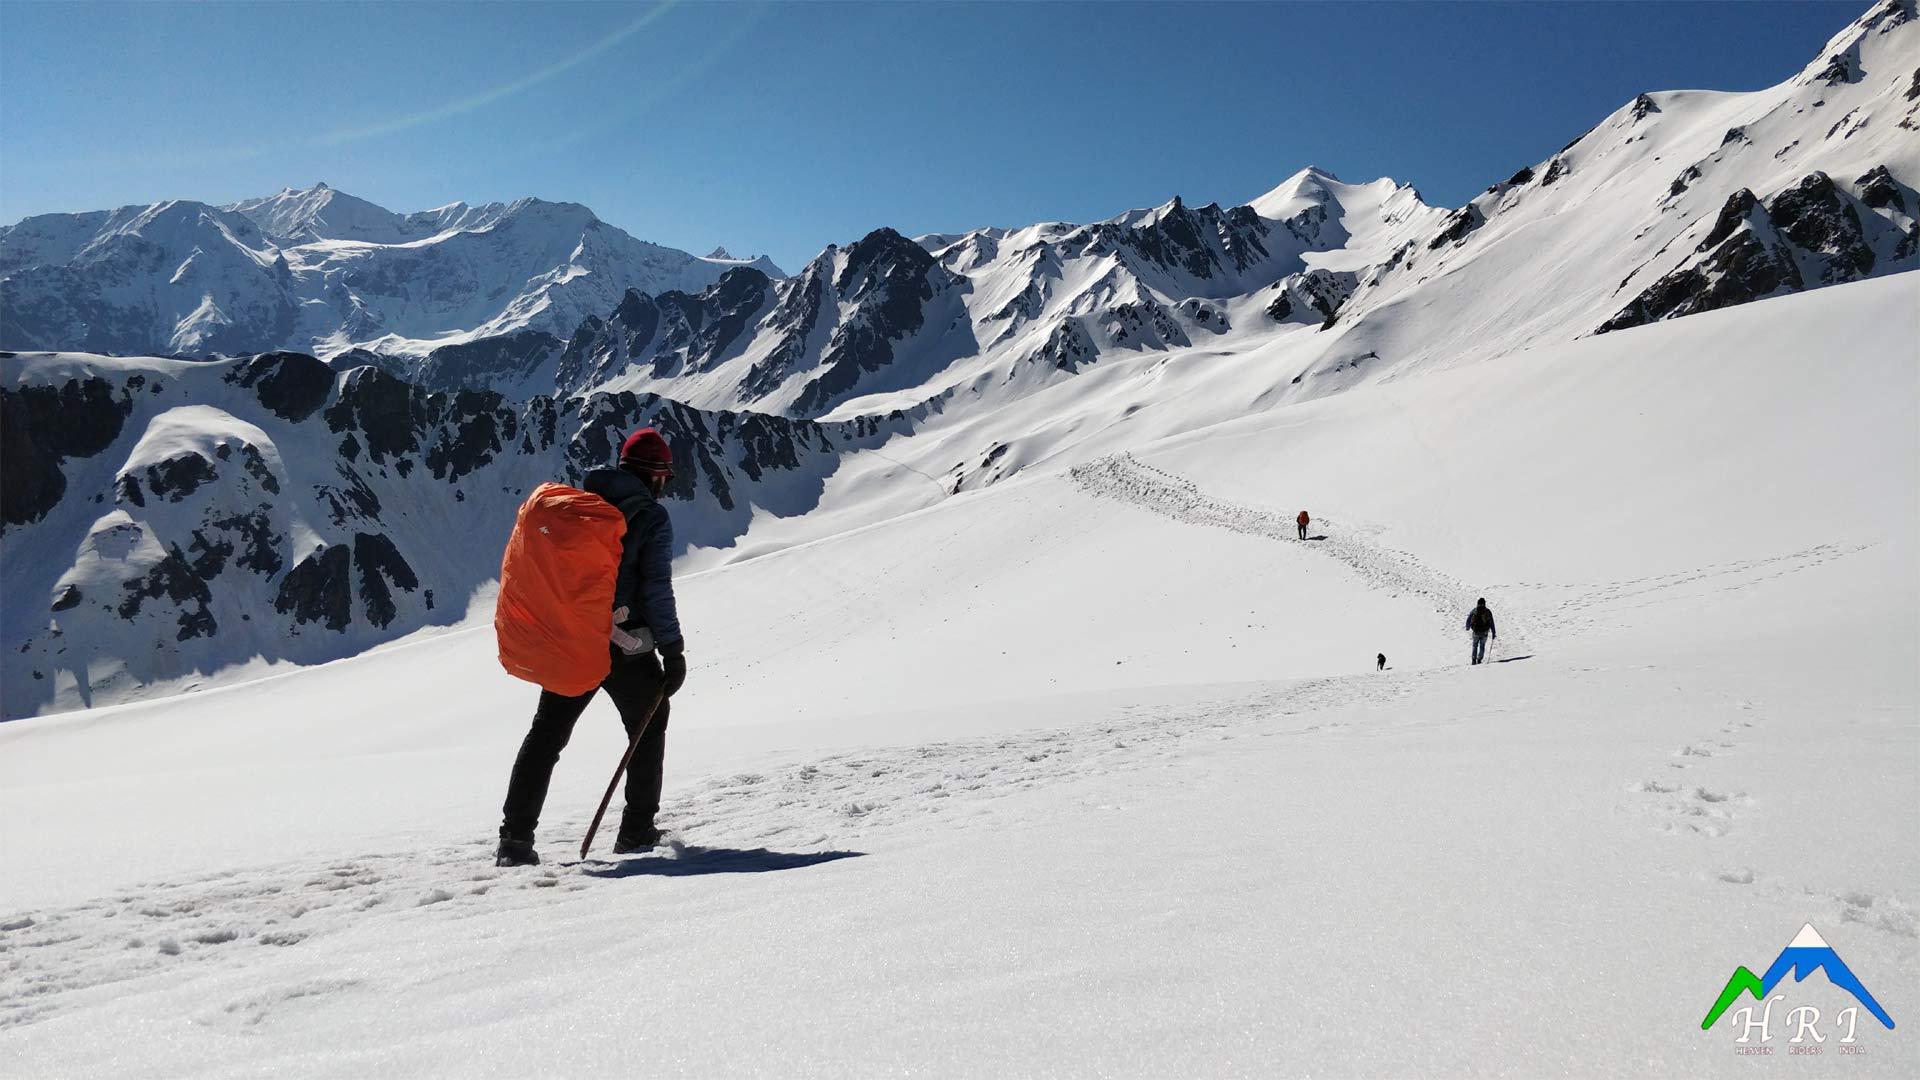 Day 5: Nagaru to Biskeri Thach, crossing Sar Pass (Trek 12kms, 7 hrs)